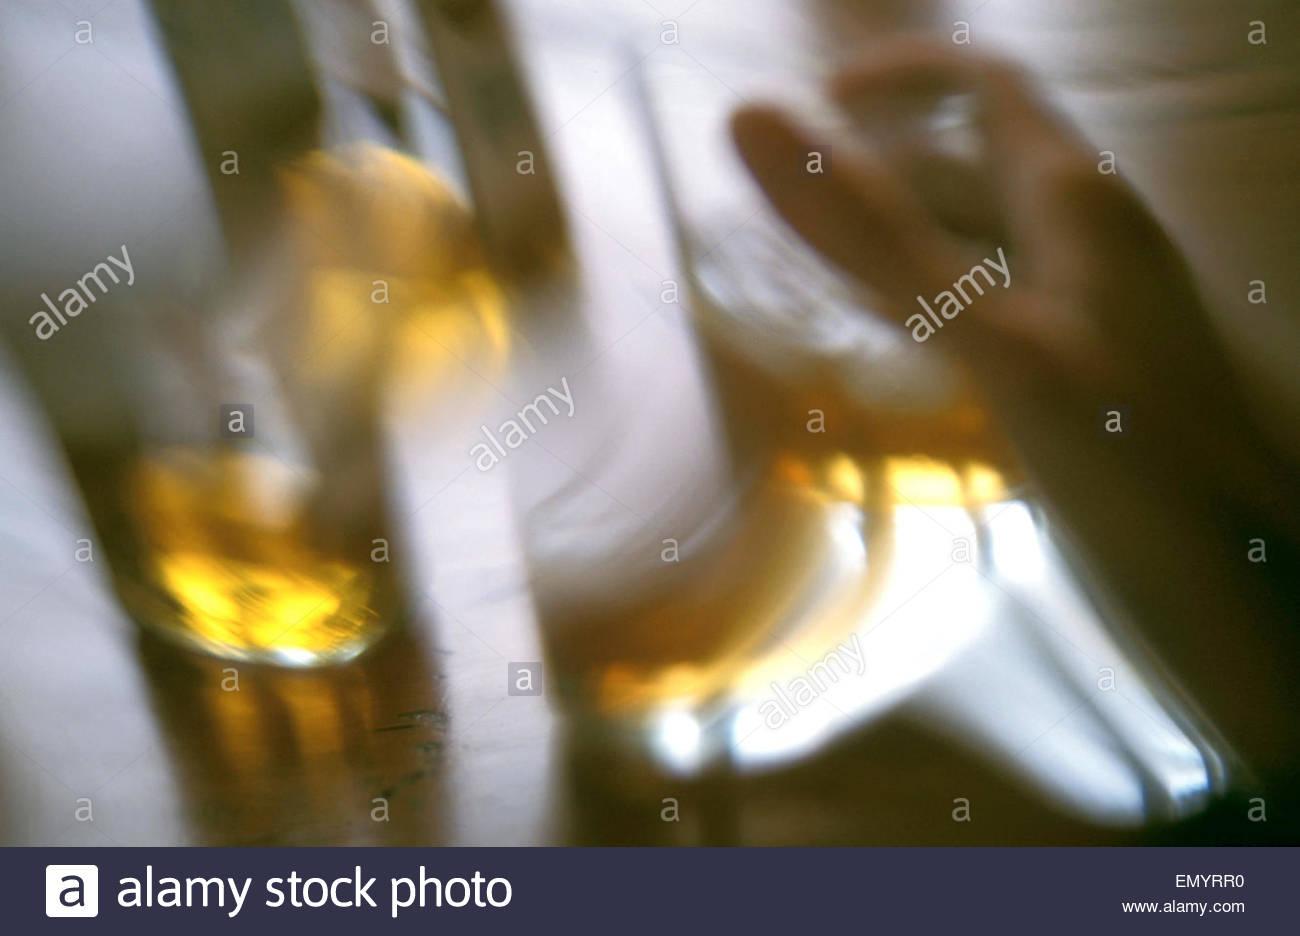 Alcohol - Stock Image